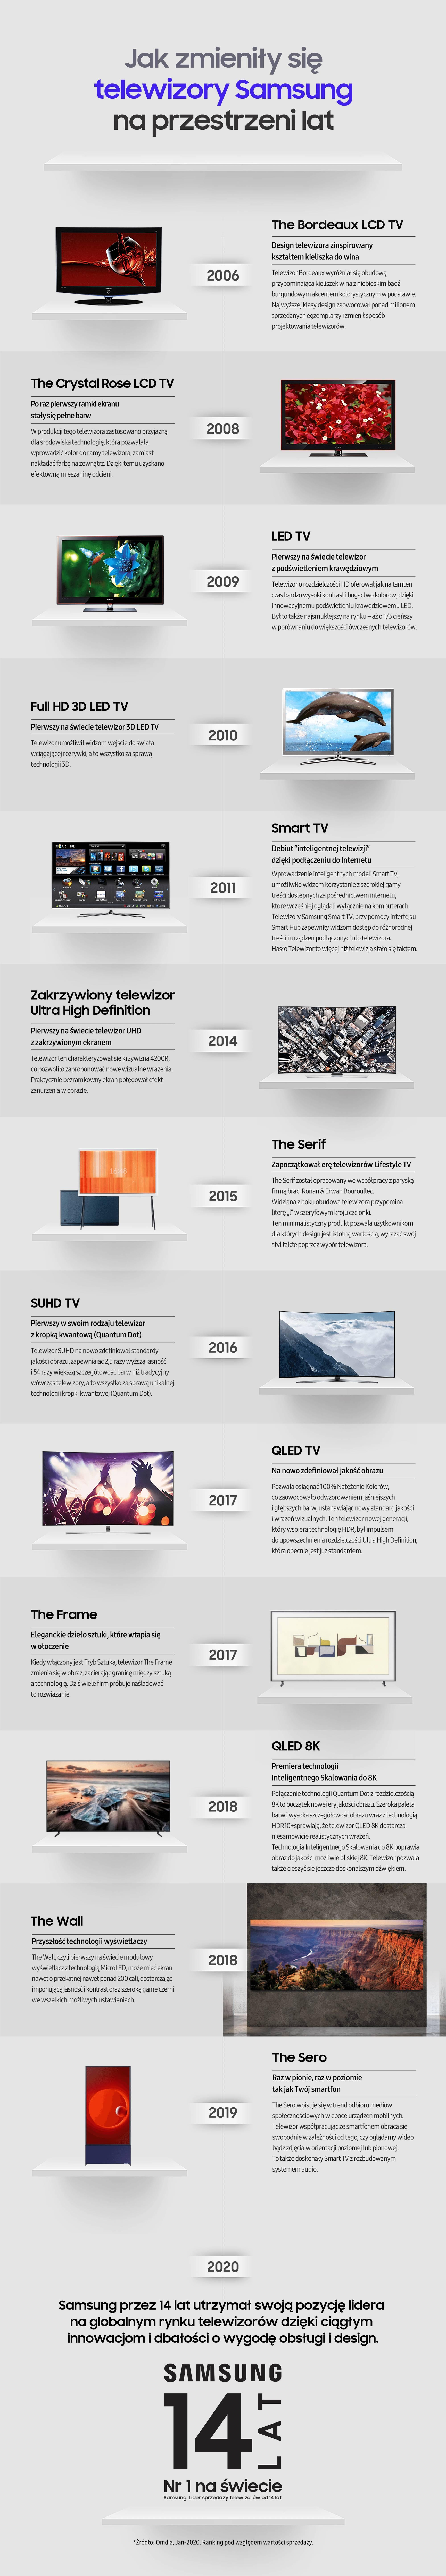 TV History info PL big 2000